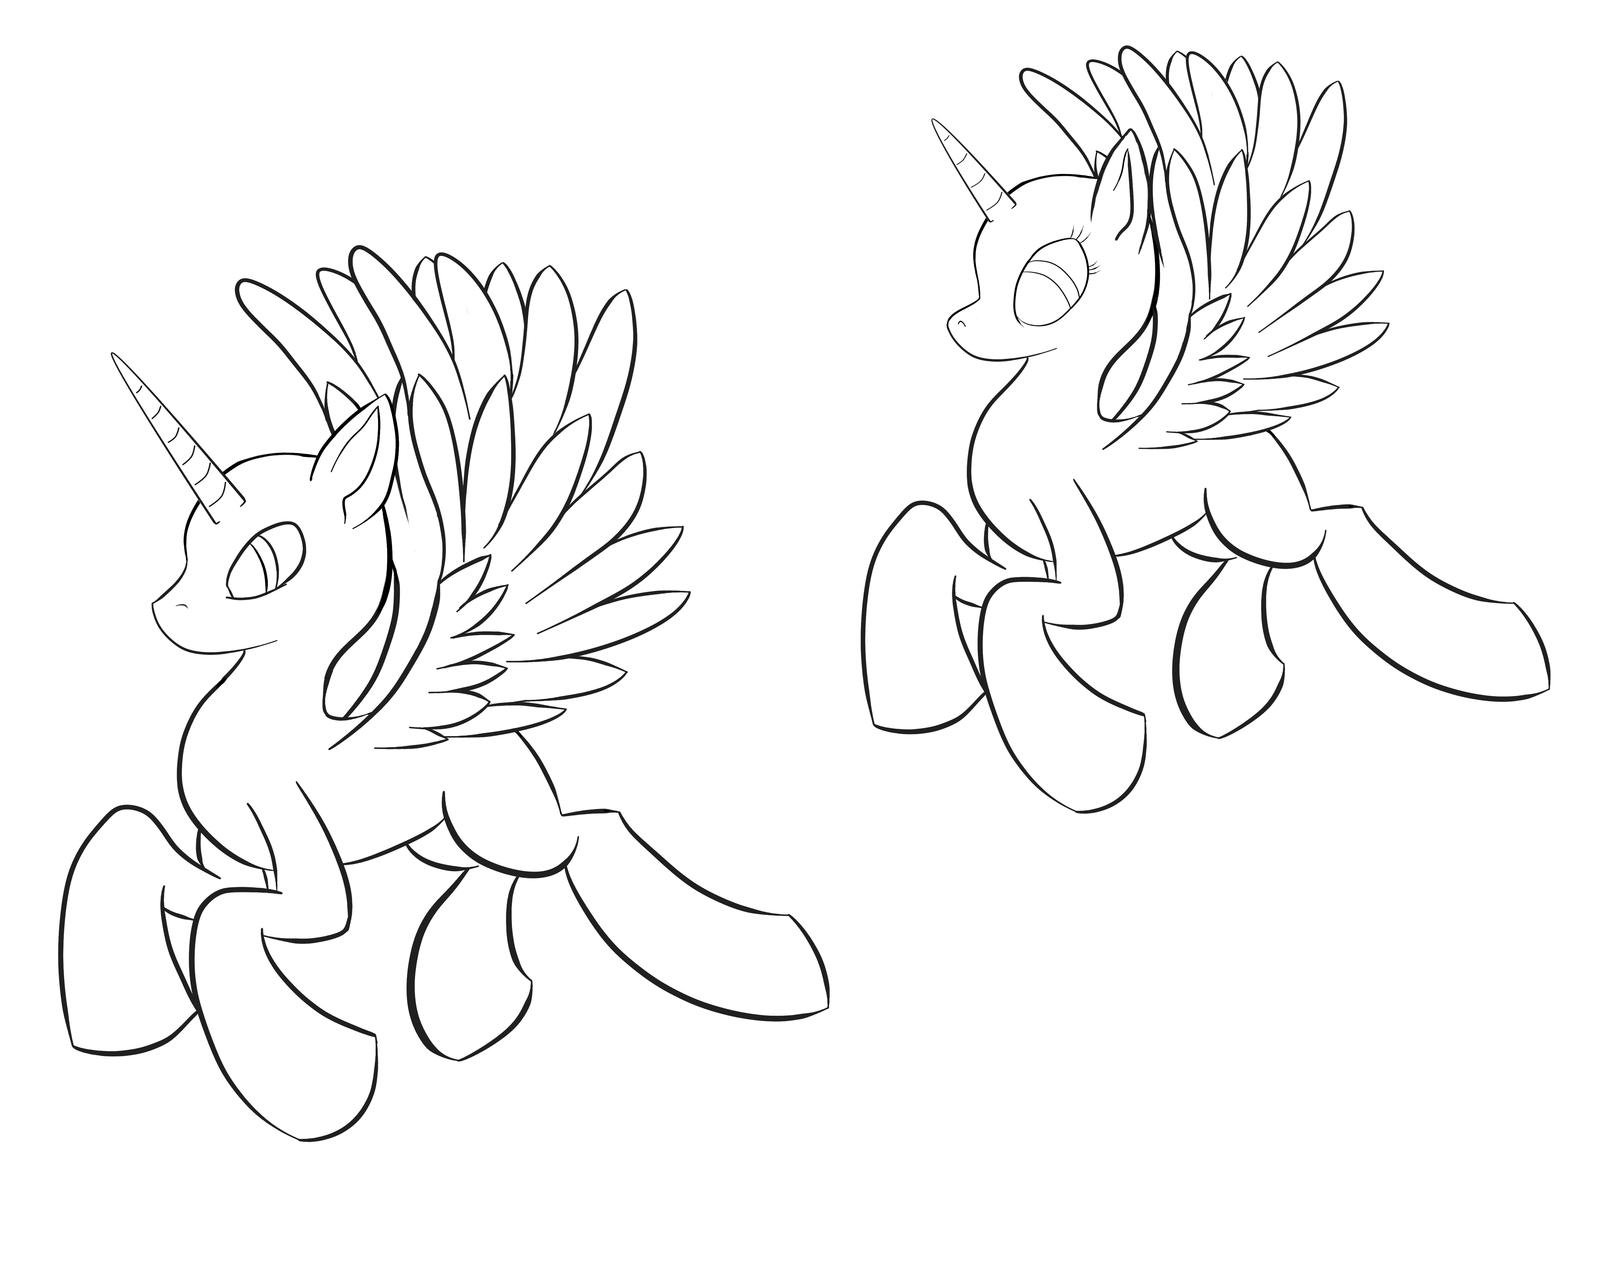 Drawn my little pony base male Alicorn  on AC whiteraven